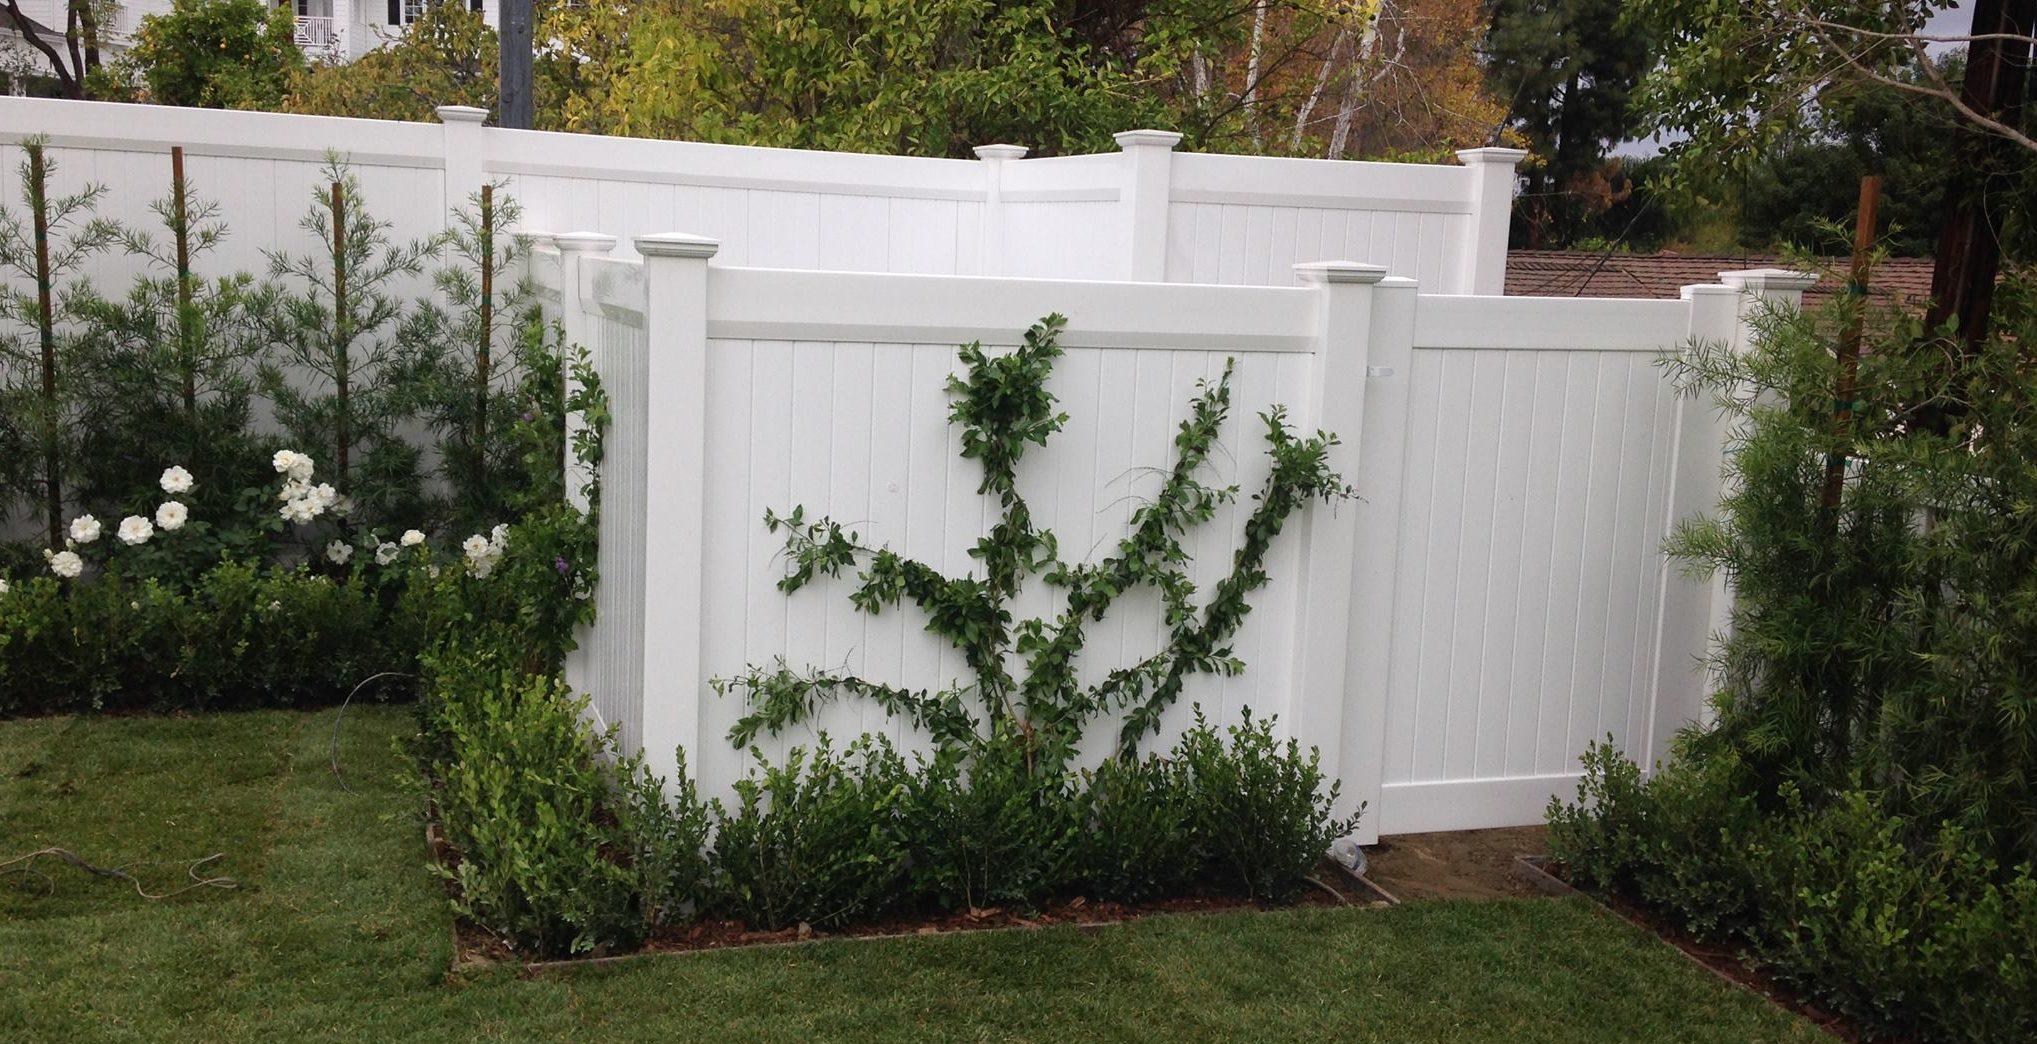 5-long-term-benefits-of-vinyl-fencing-over-wood-fencing